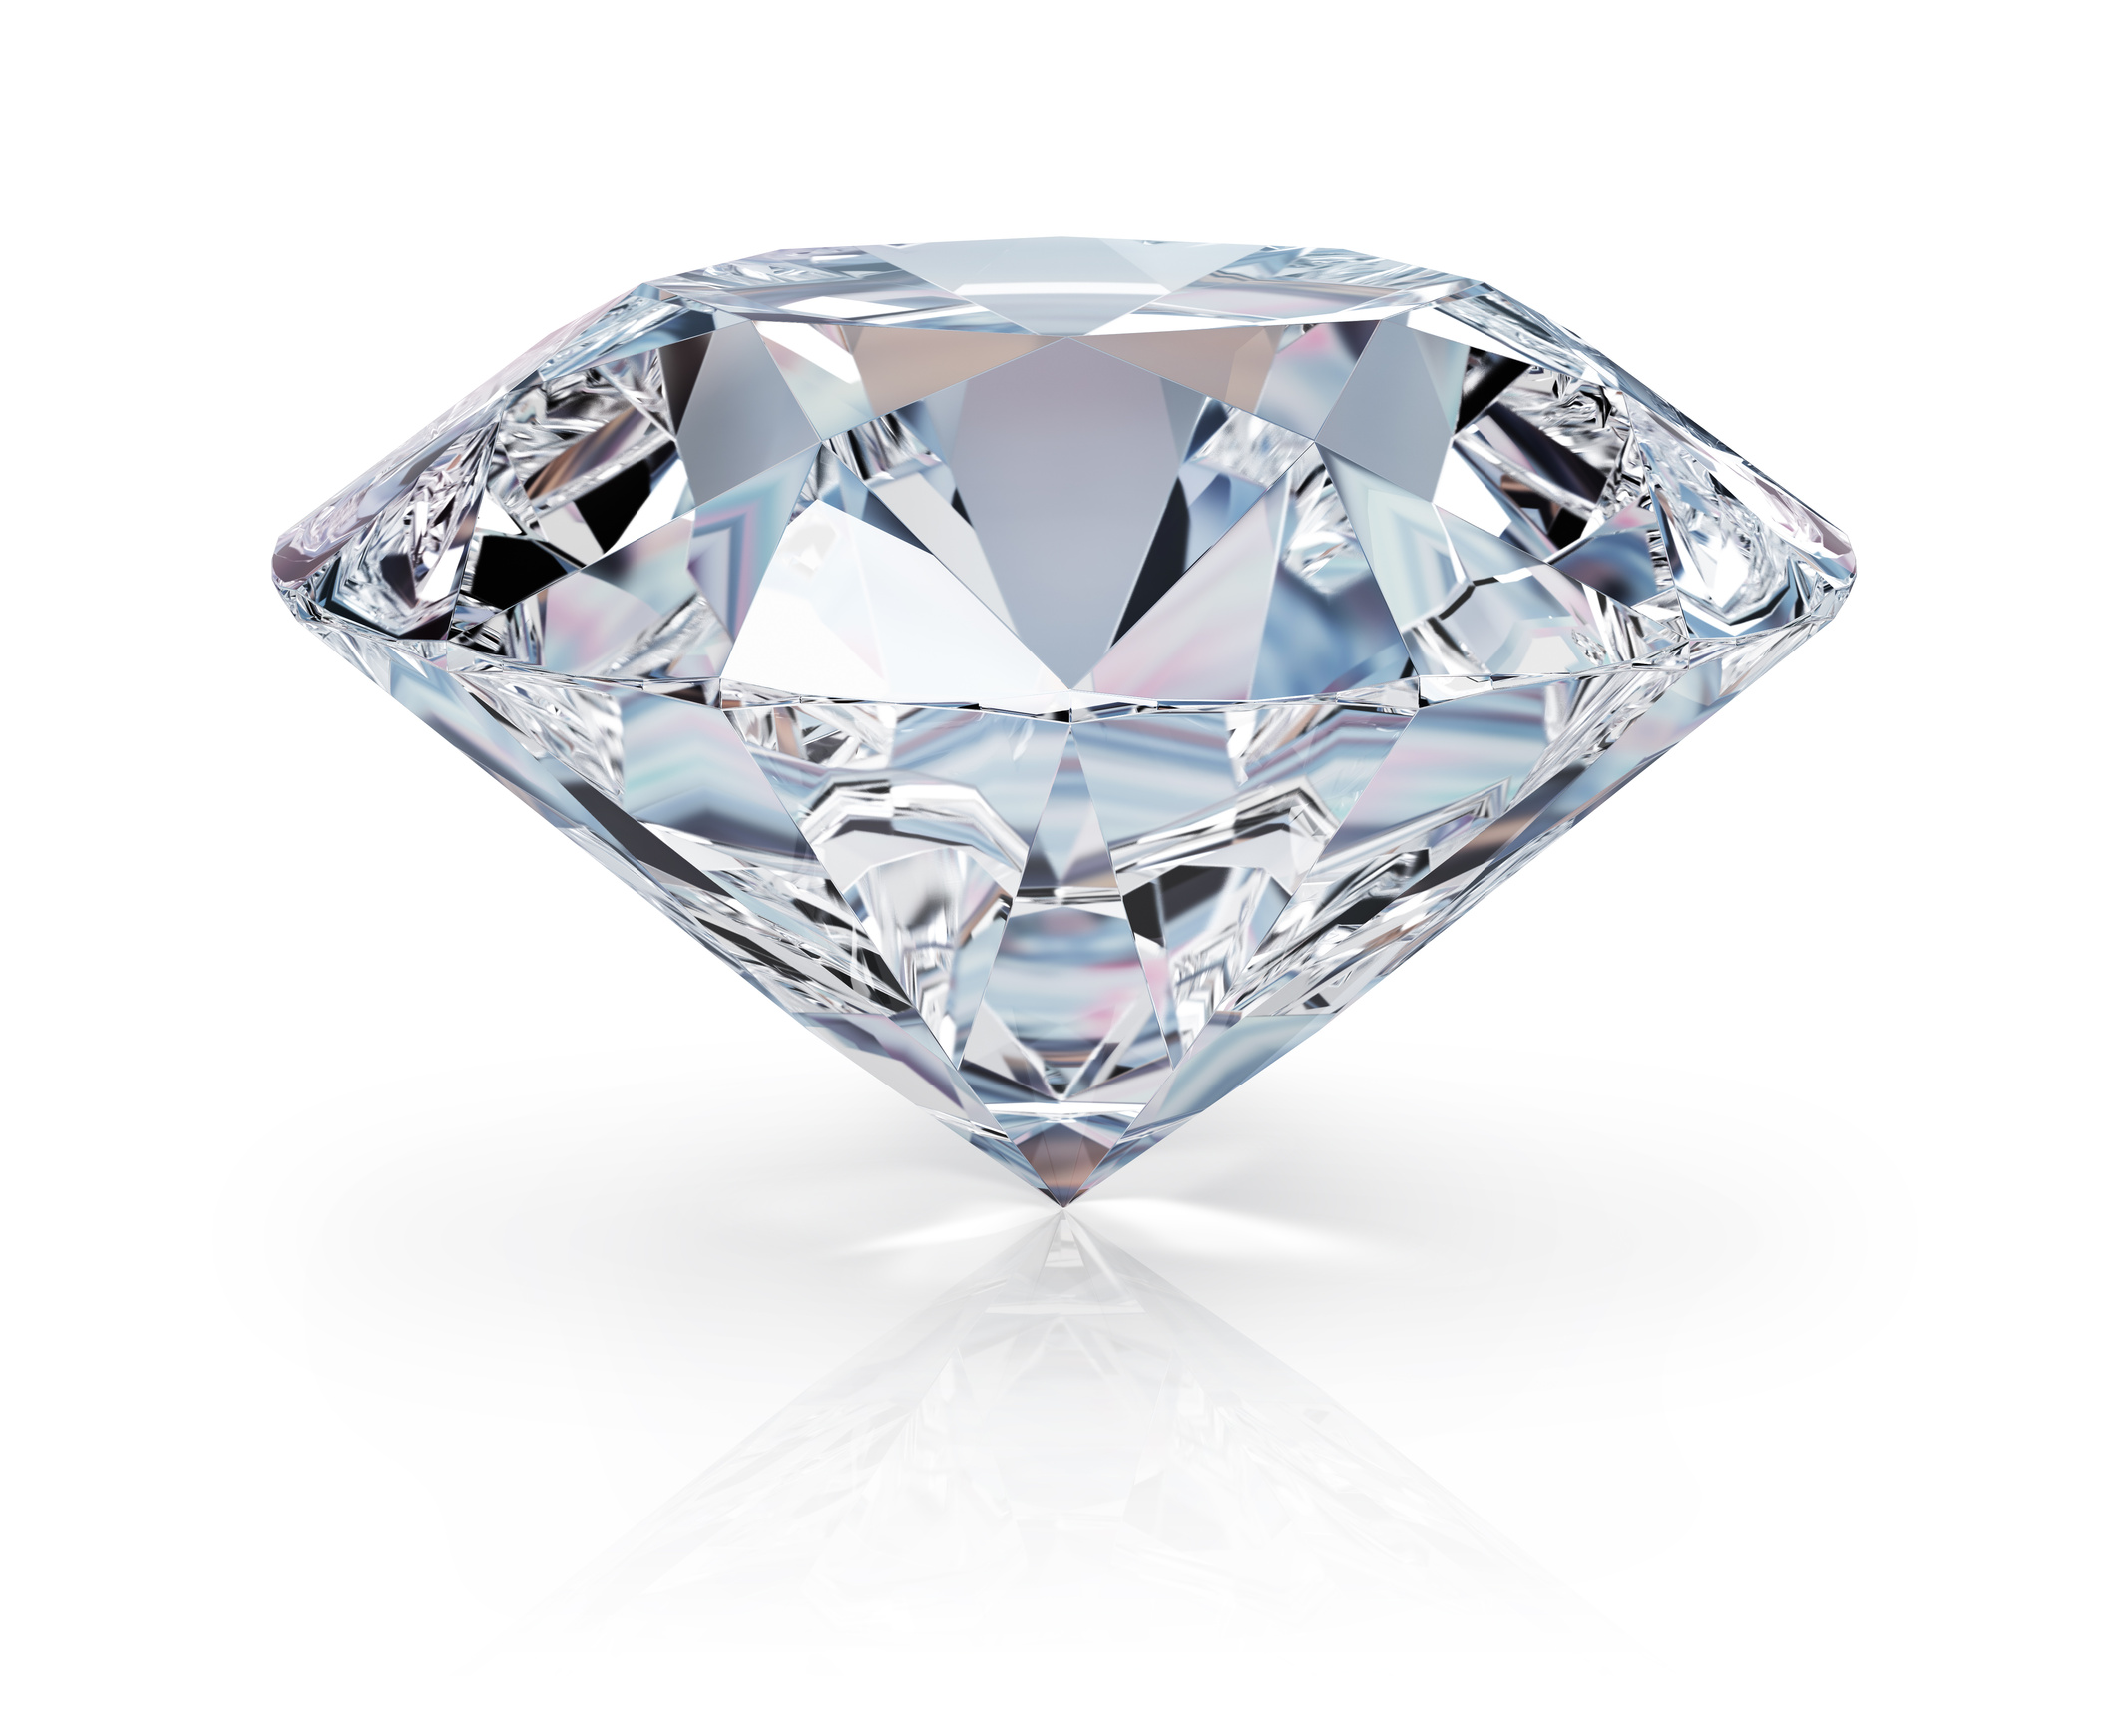 Diamond HD PNG - 120184